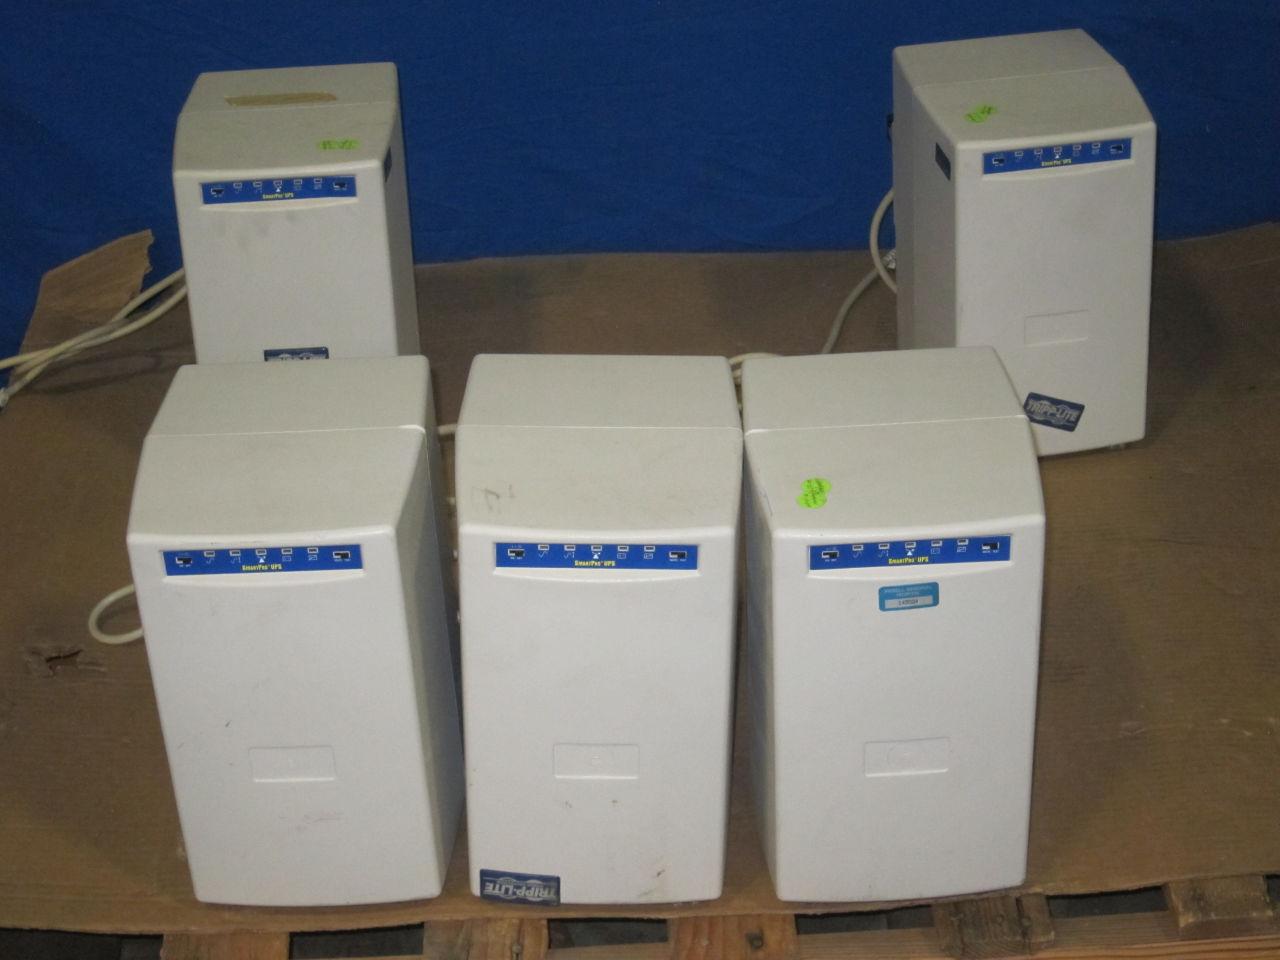 TRIPP-LITE Smart 700 HG  - Lot of 5 Uninterruptible Power Supply / UPS